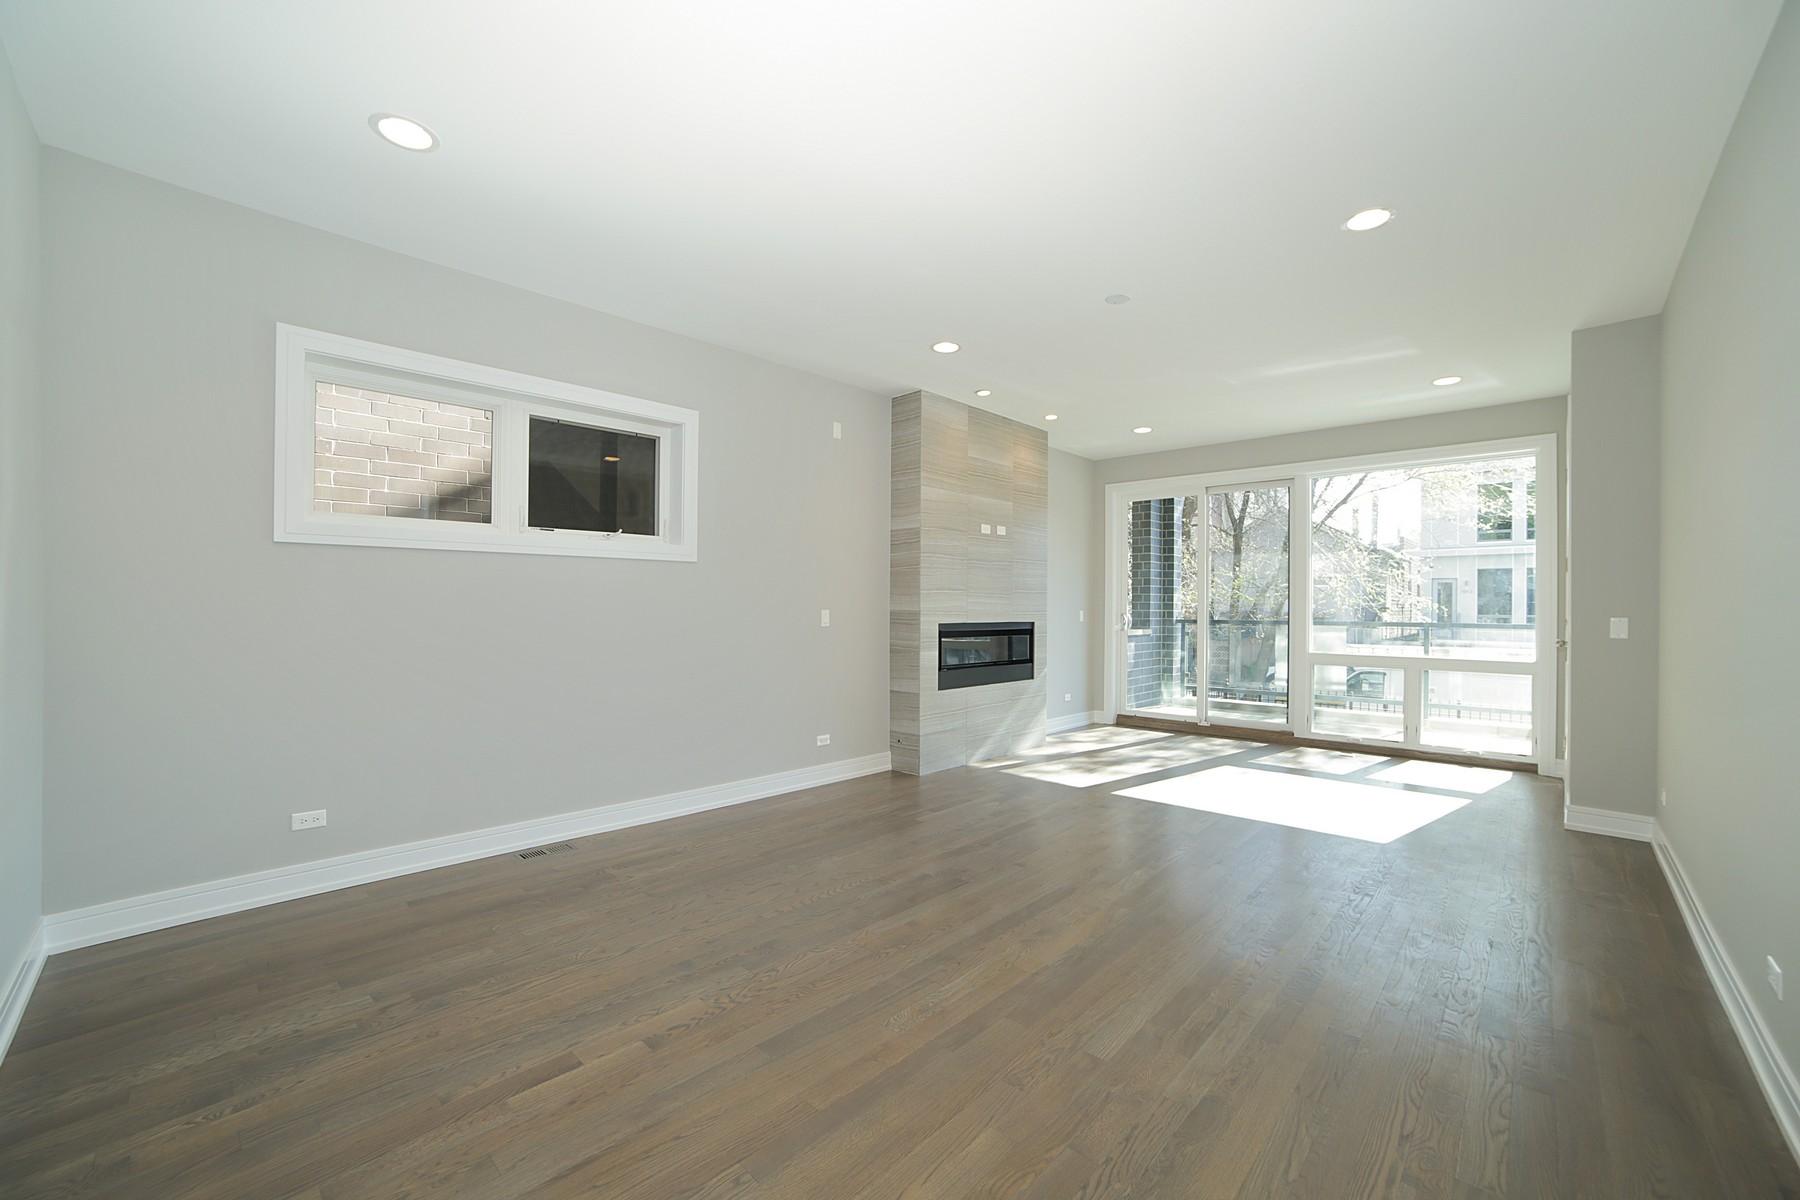 Duplex por un Venta en New Construction With Great Curb Appeal 1110 N Marshfield Avenue Unit 1 West Town, Chicago, Illinois 60622 Estados Unidos